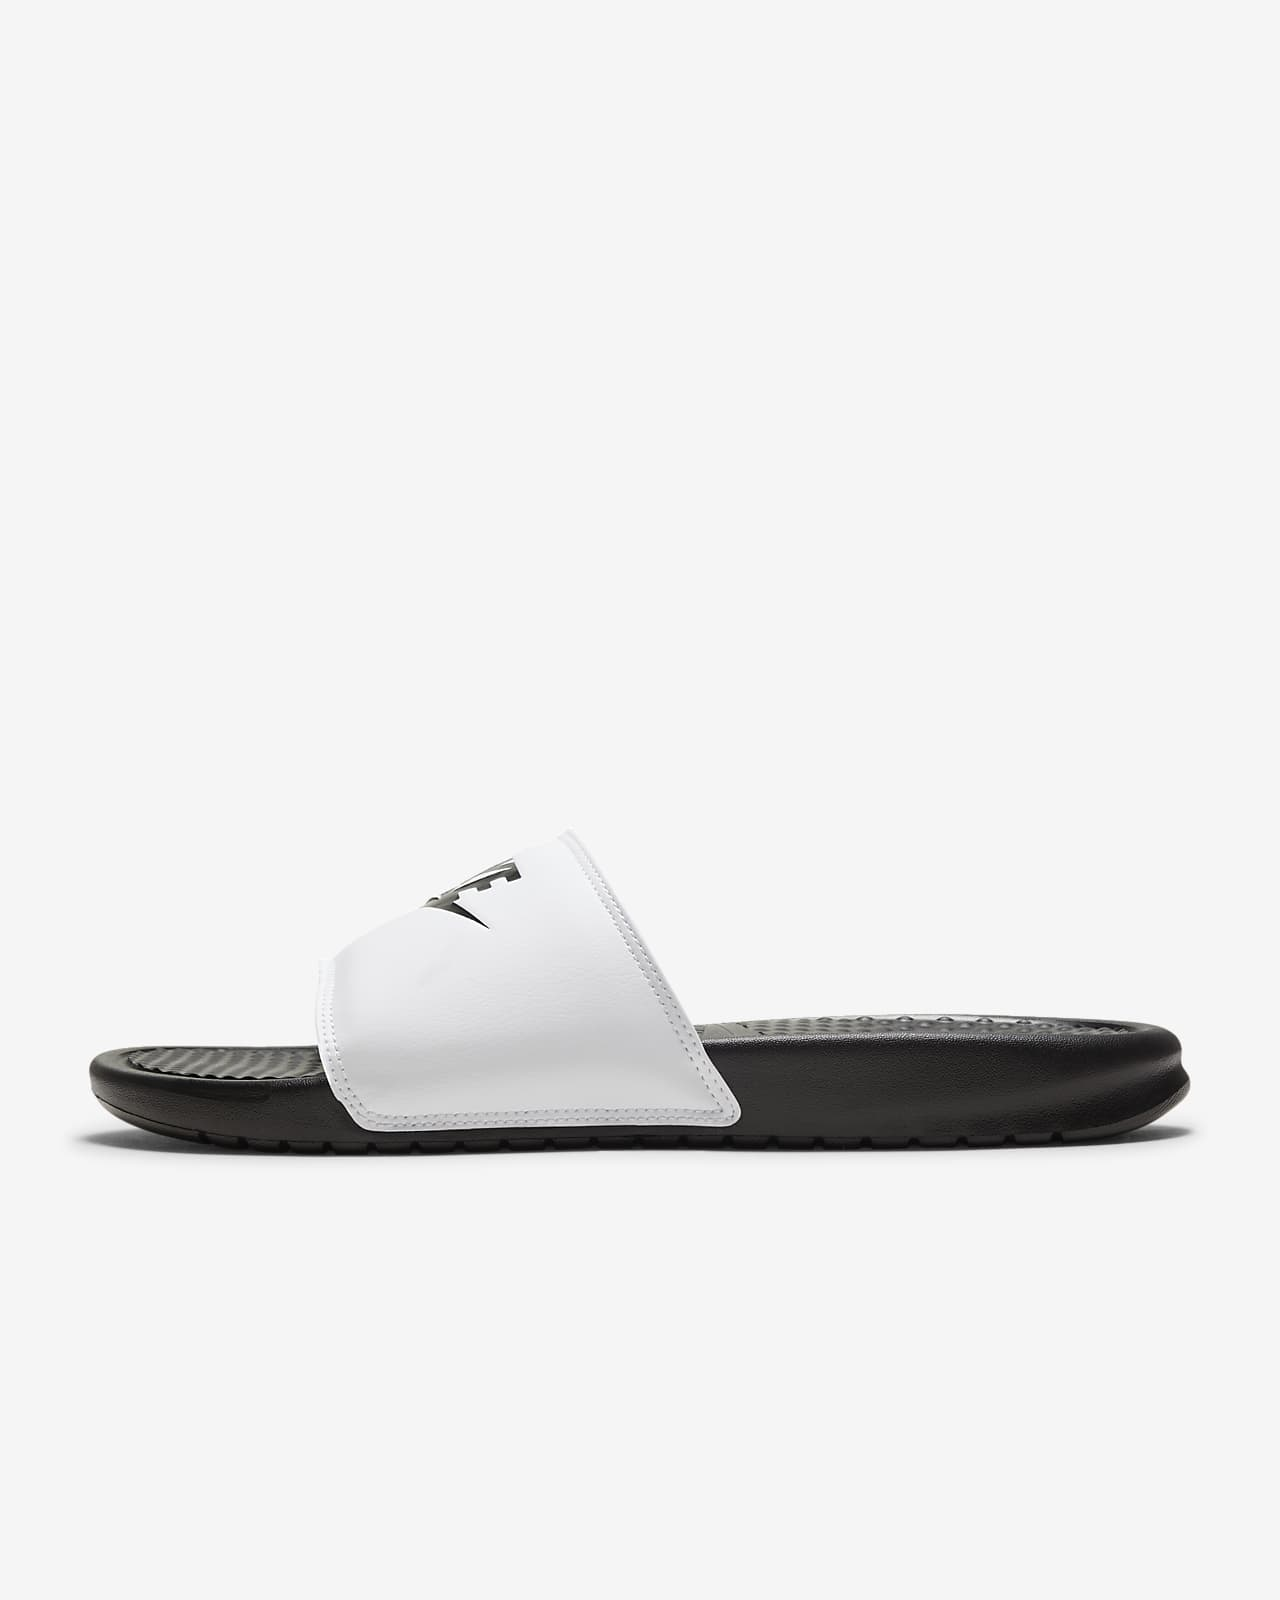 Nike Benassi JDI Mismatch 男子拖鞋